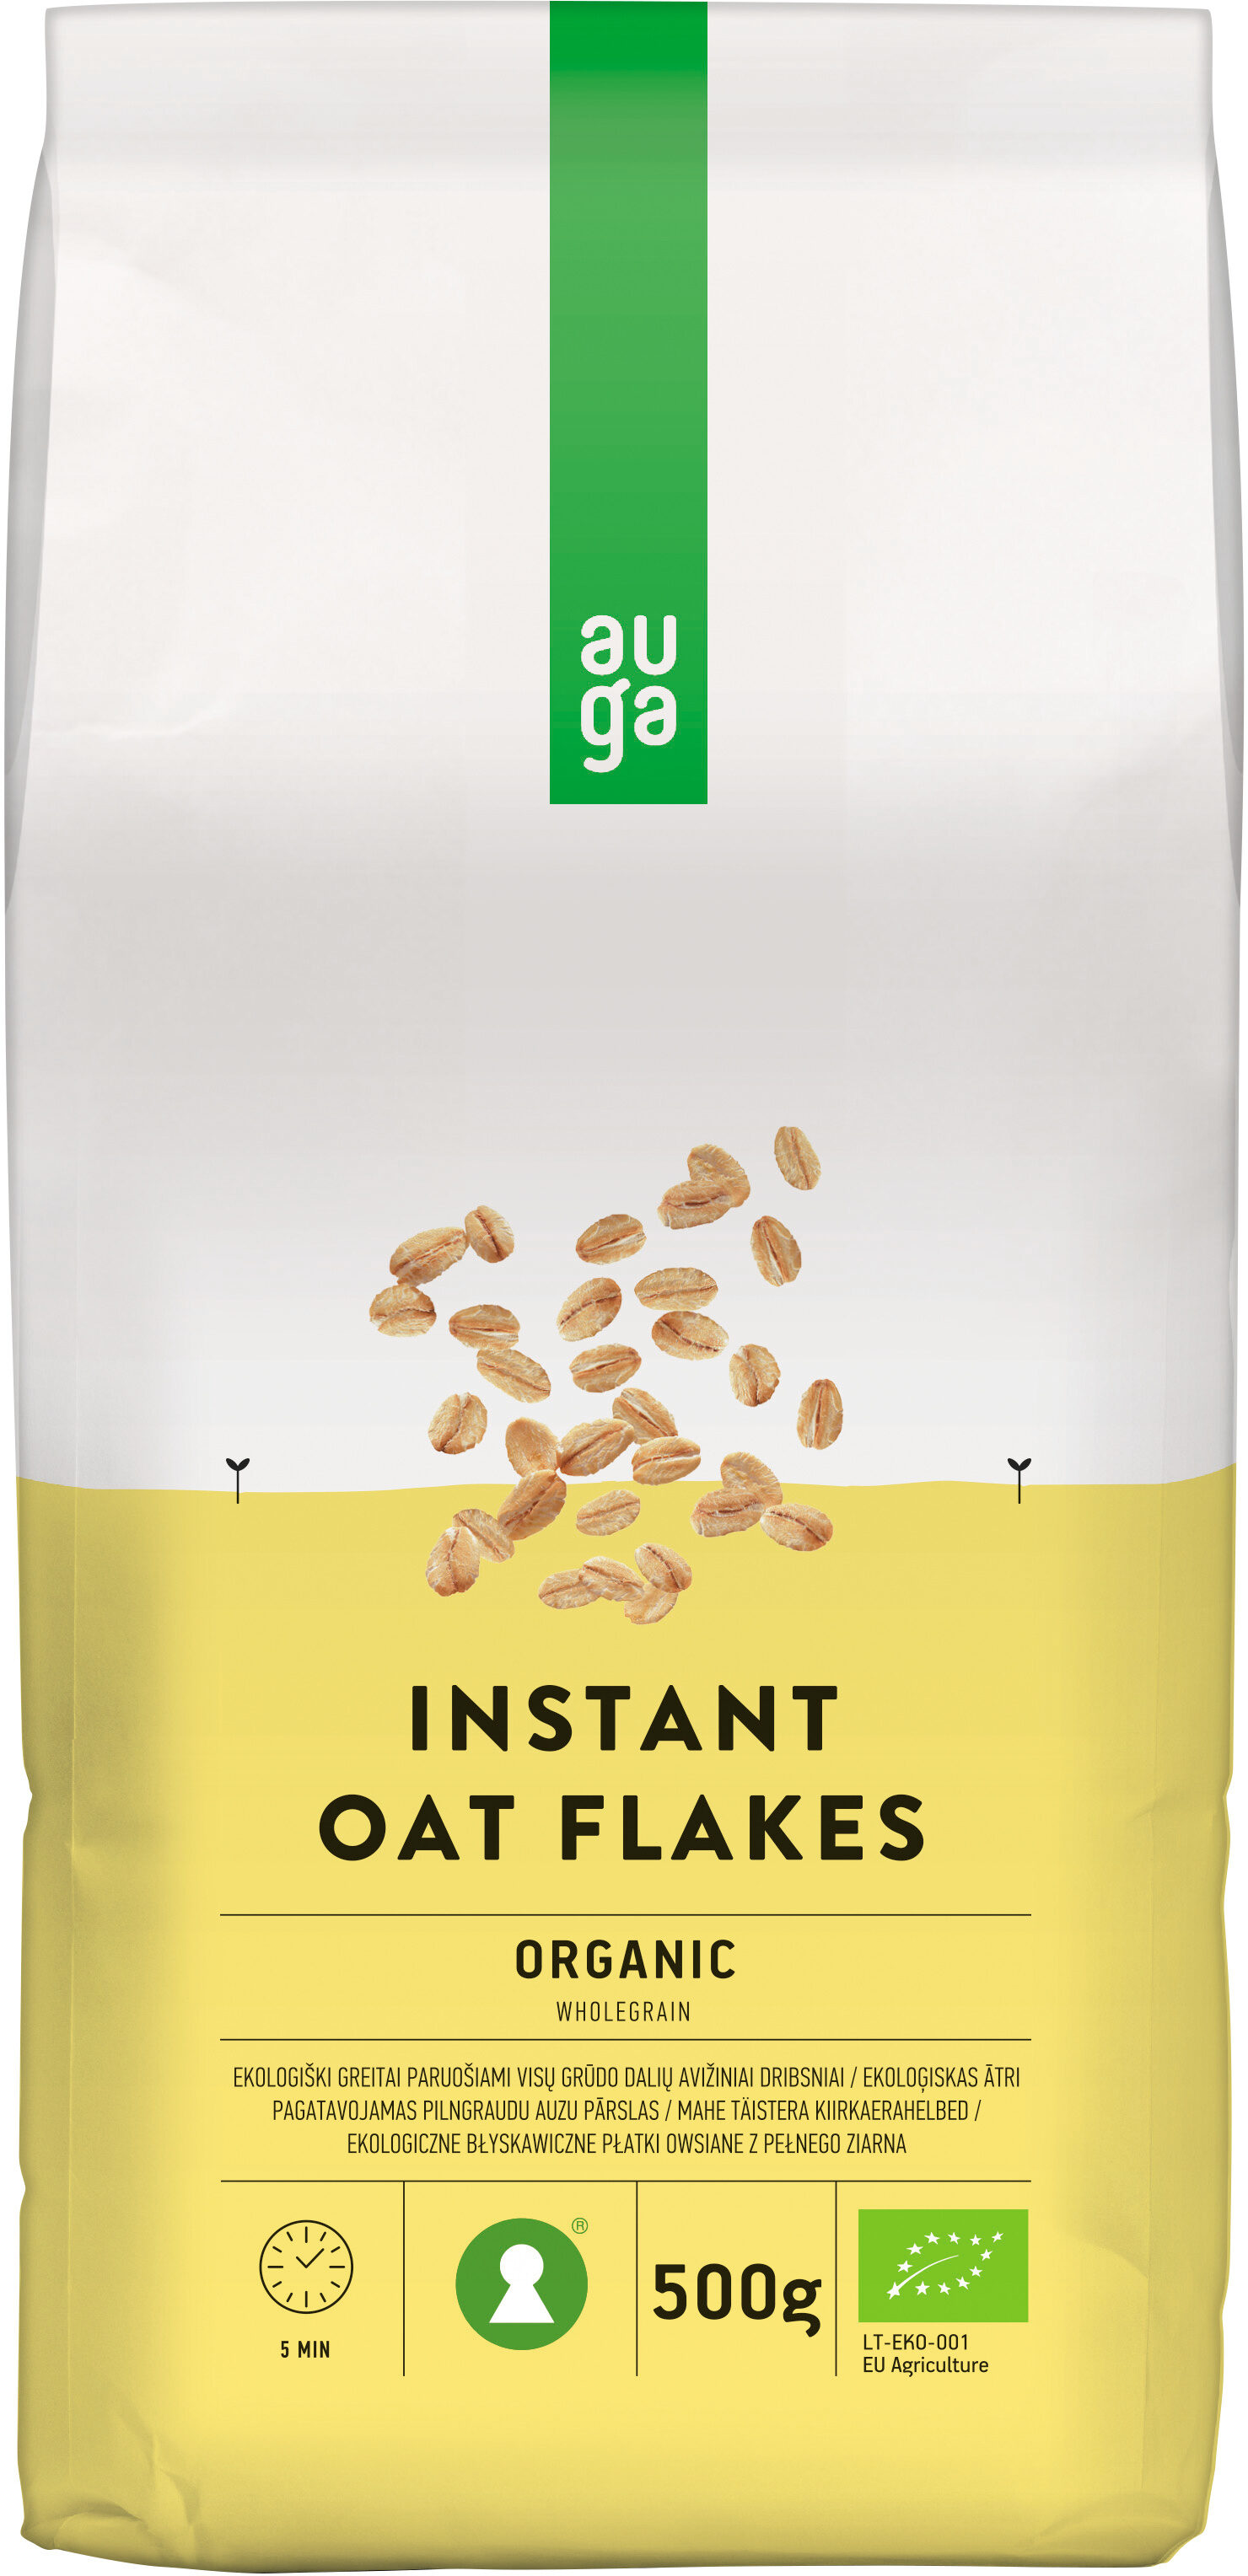 Instant Oat Flakes - Product - en